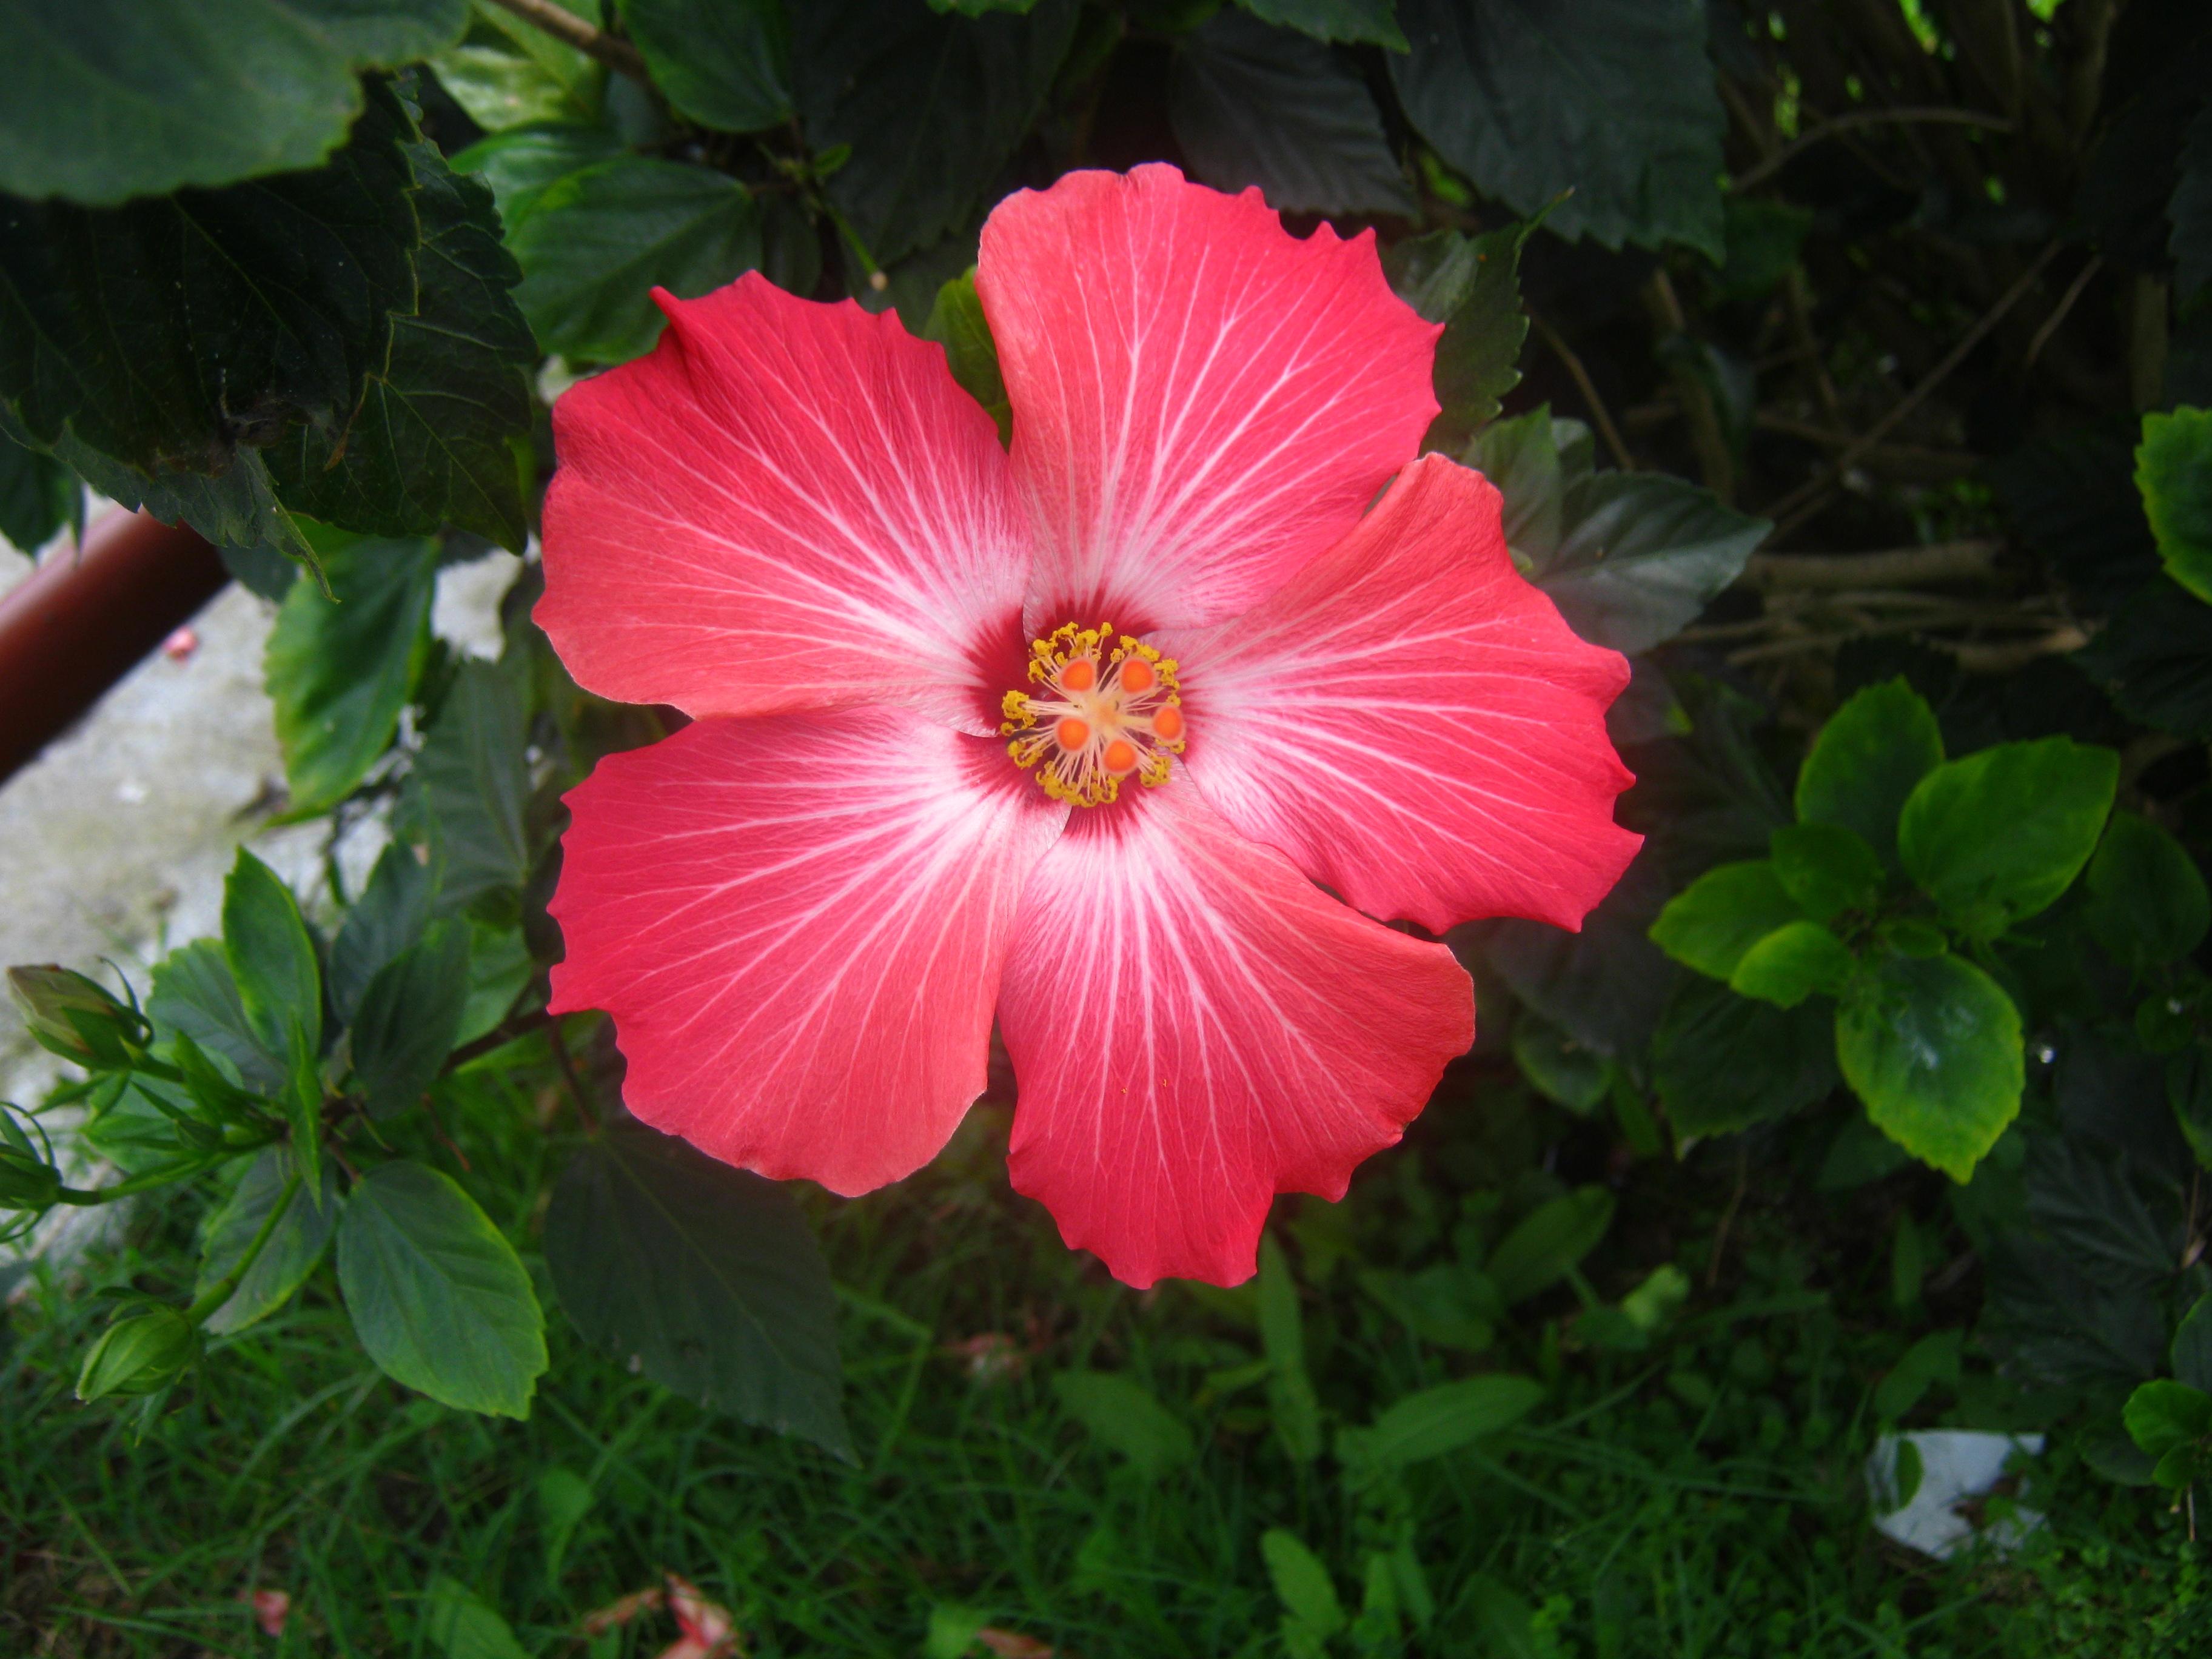 Flor de amapola amapola flower by dariusmondracos on for Amapola jardin de infantes palermo